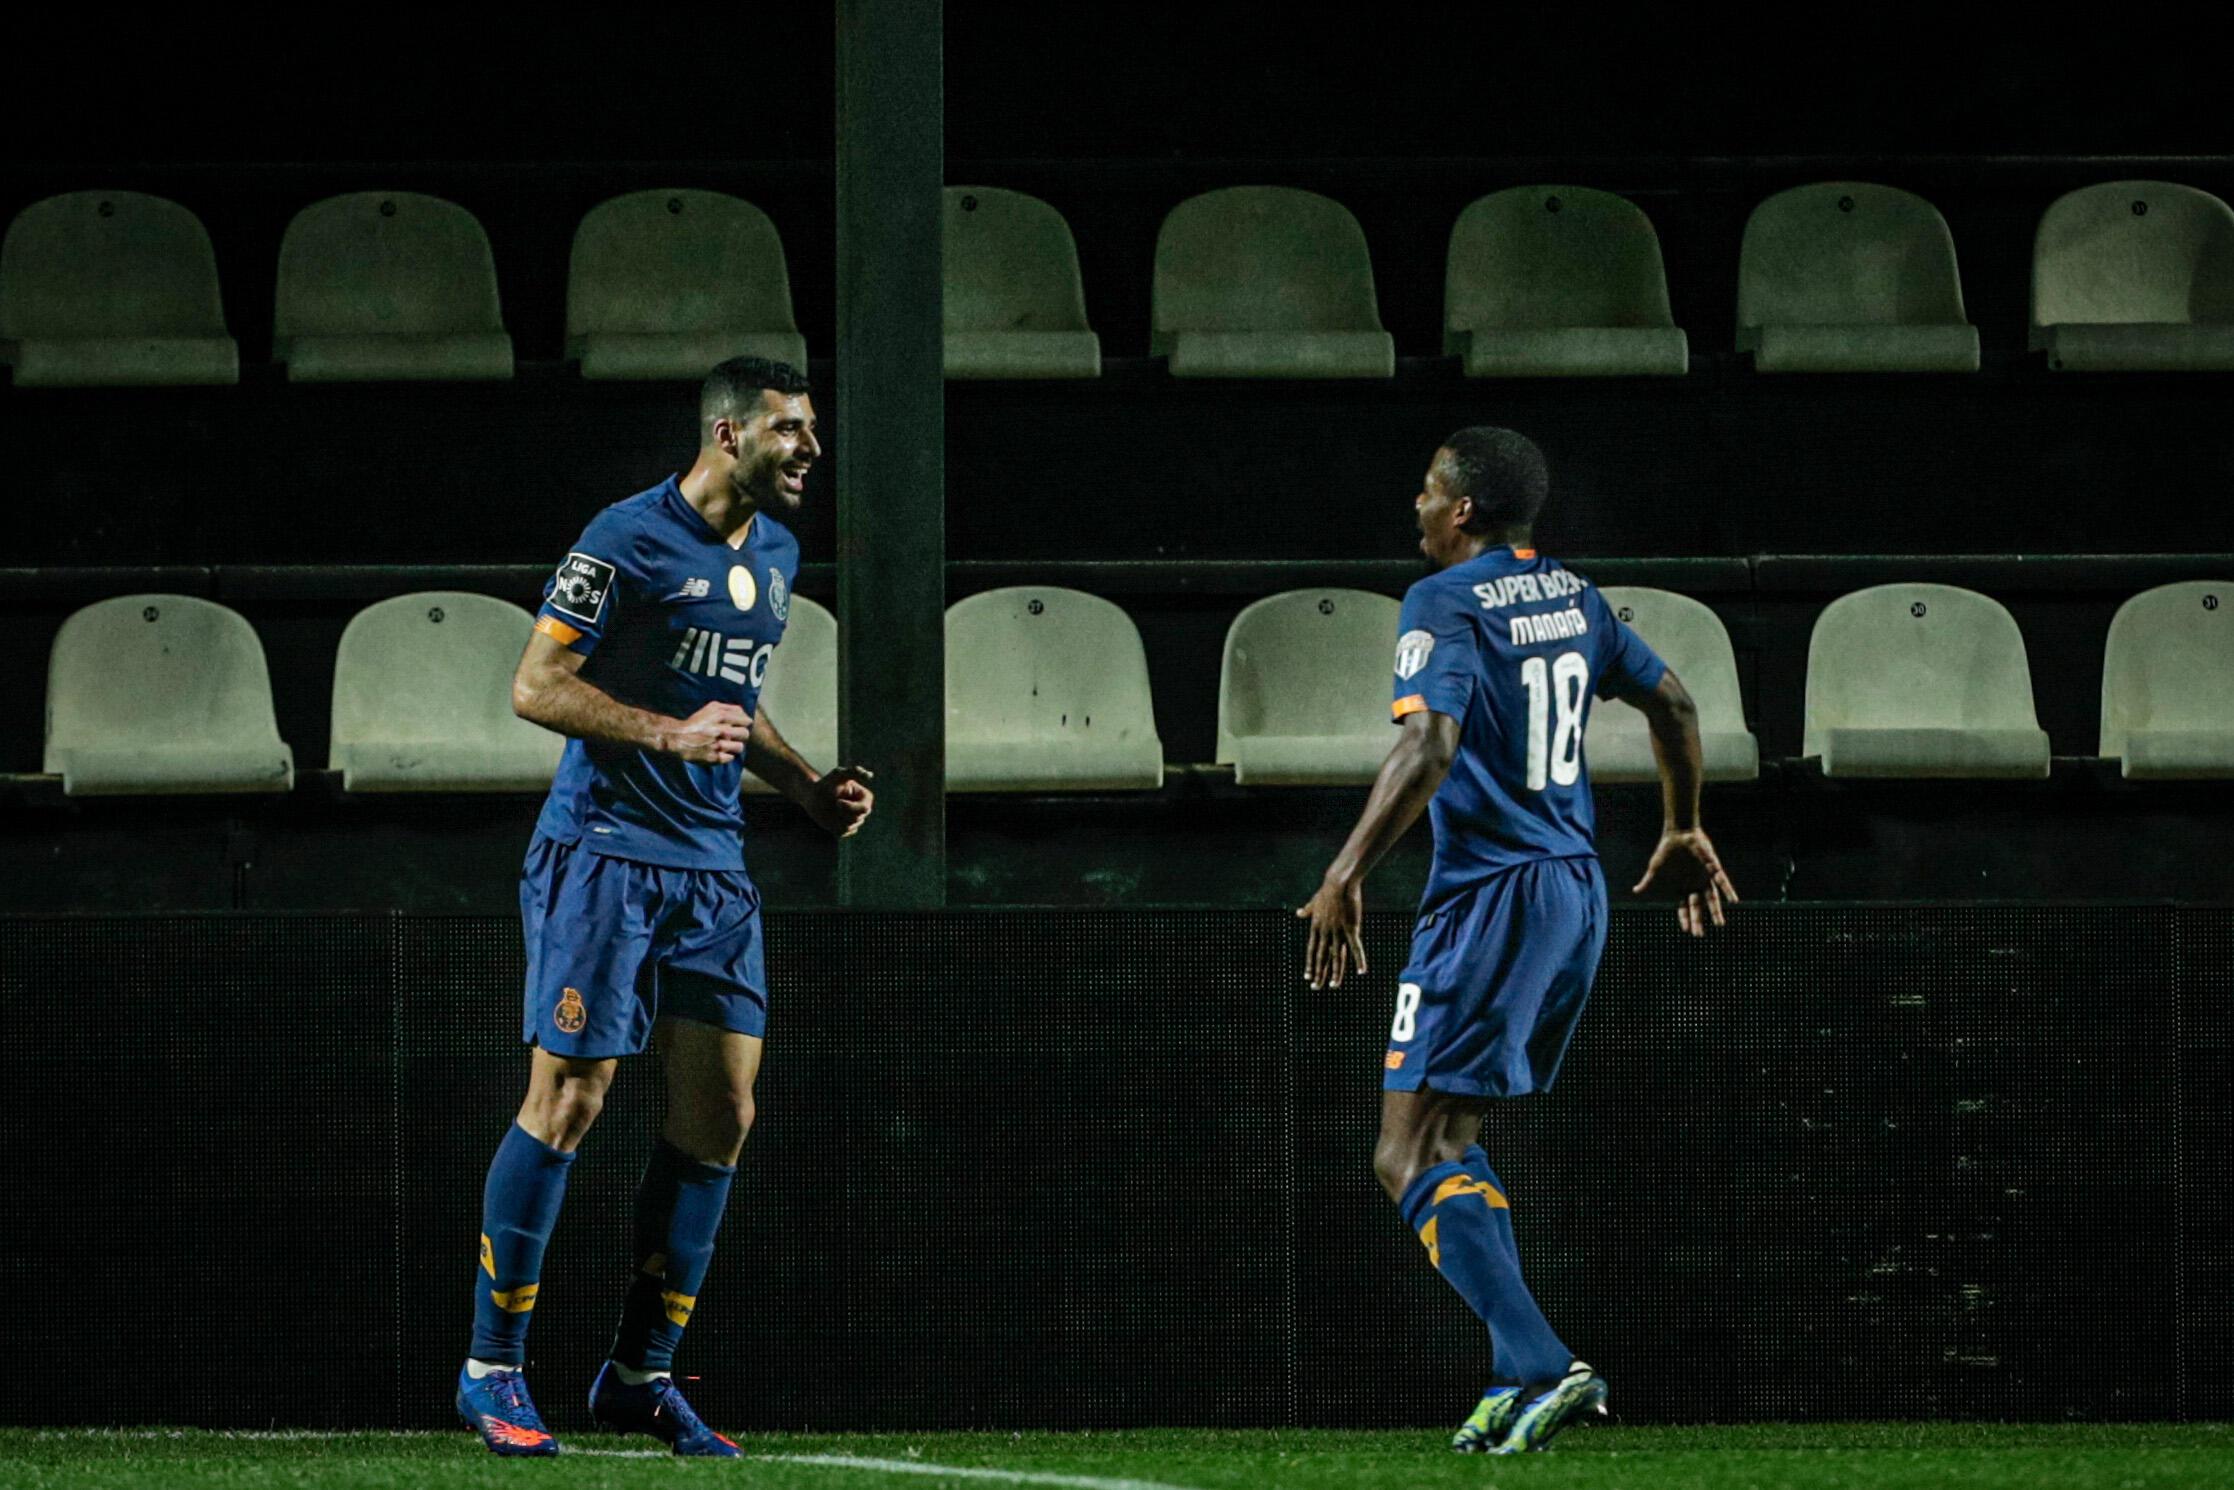 Mehdi Taremi - FC Porto - Futebol - Liga Portuguesa - Football - Desporto - Irão - Wilson Manafá